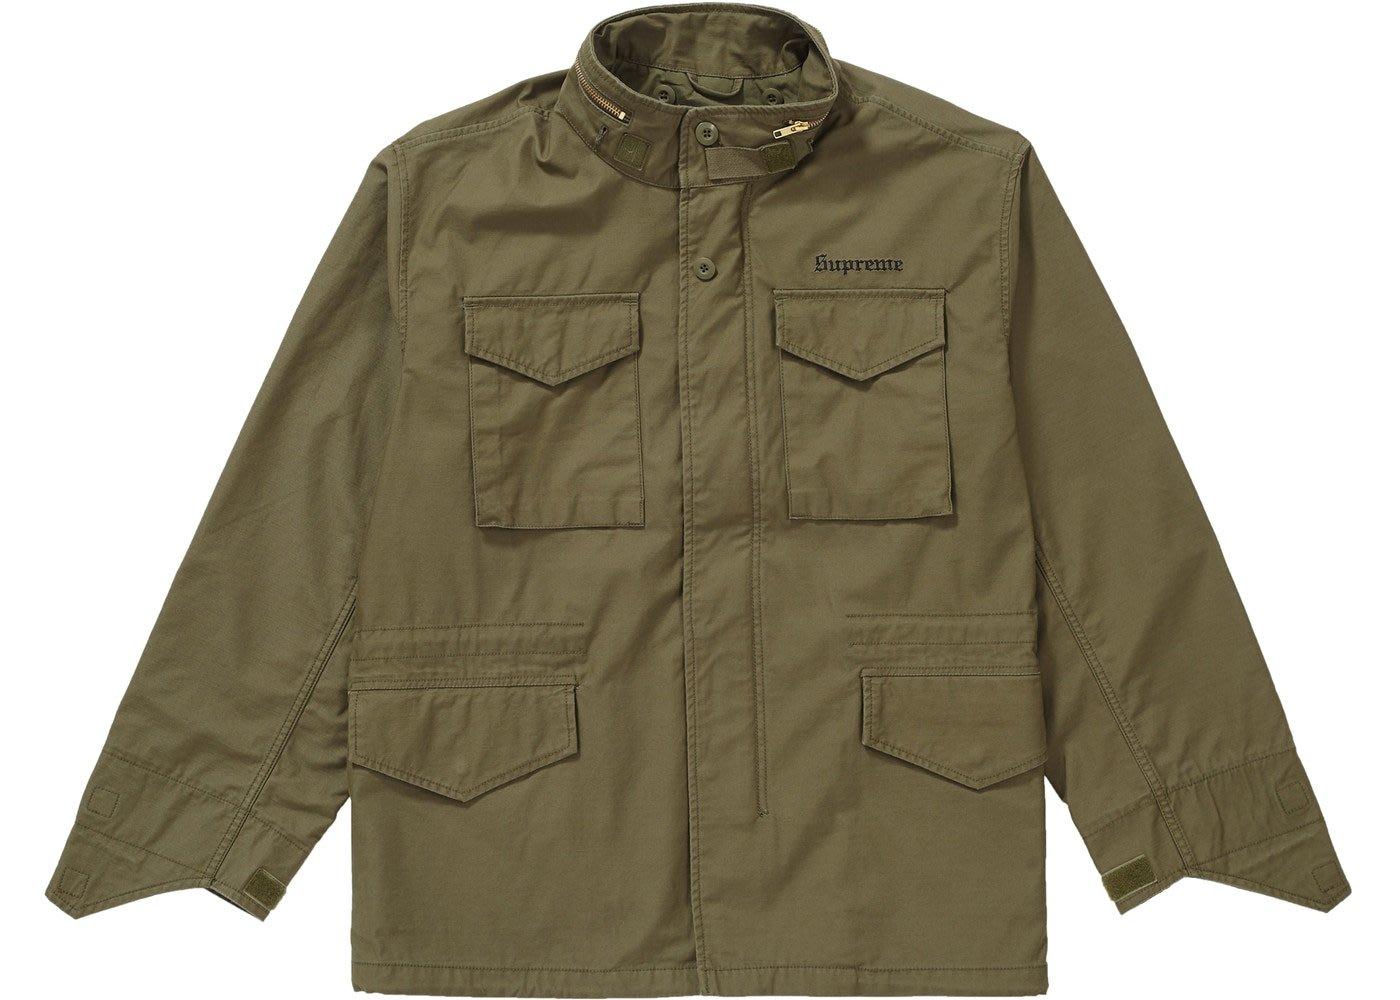 【美國鞋校】 預購 Supreme FW18 The Killer M-65 Jacket 黑/軍綠 2色